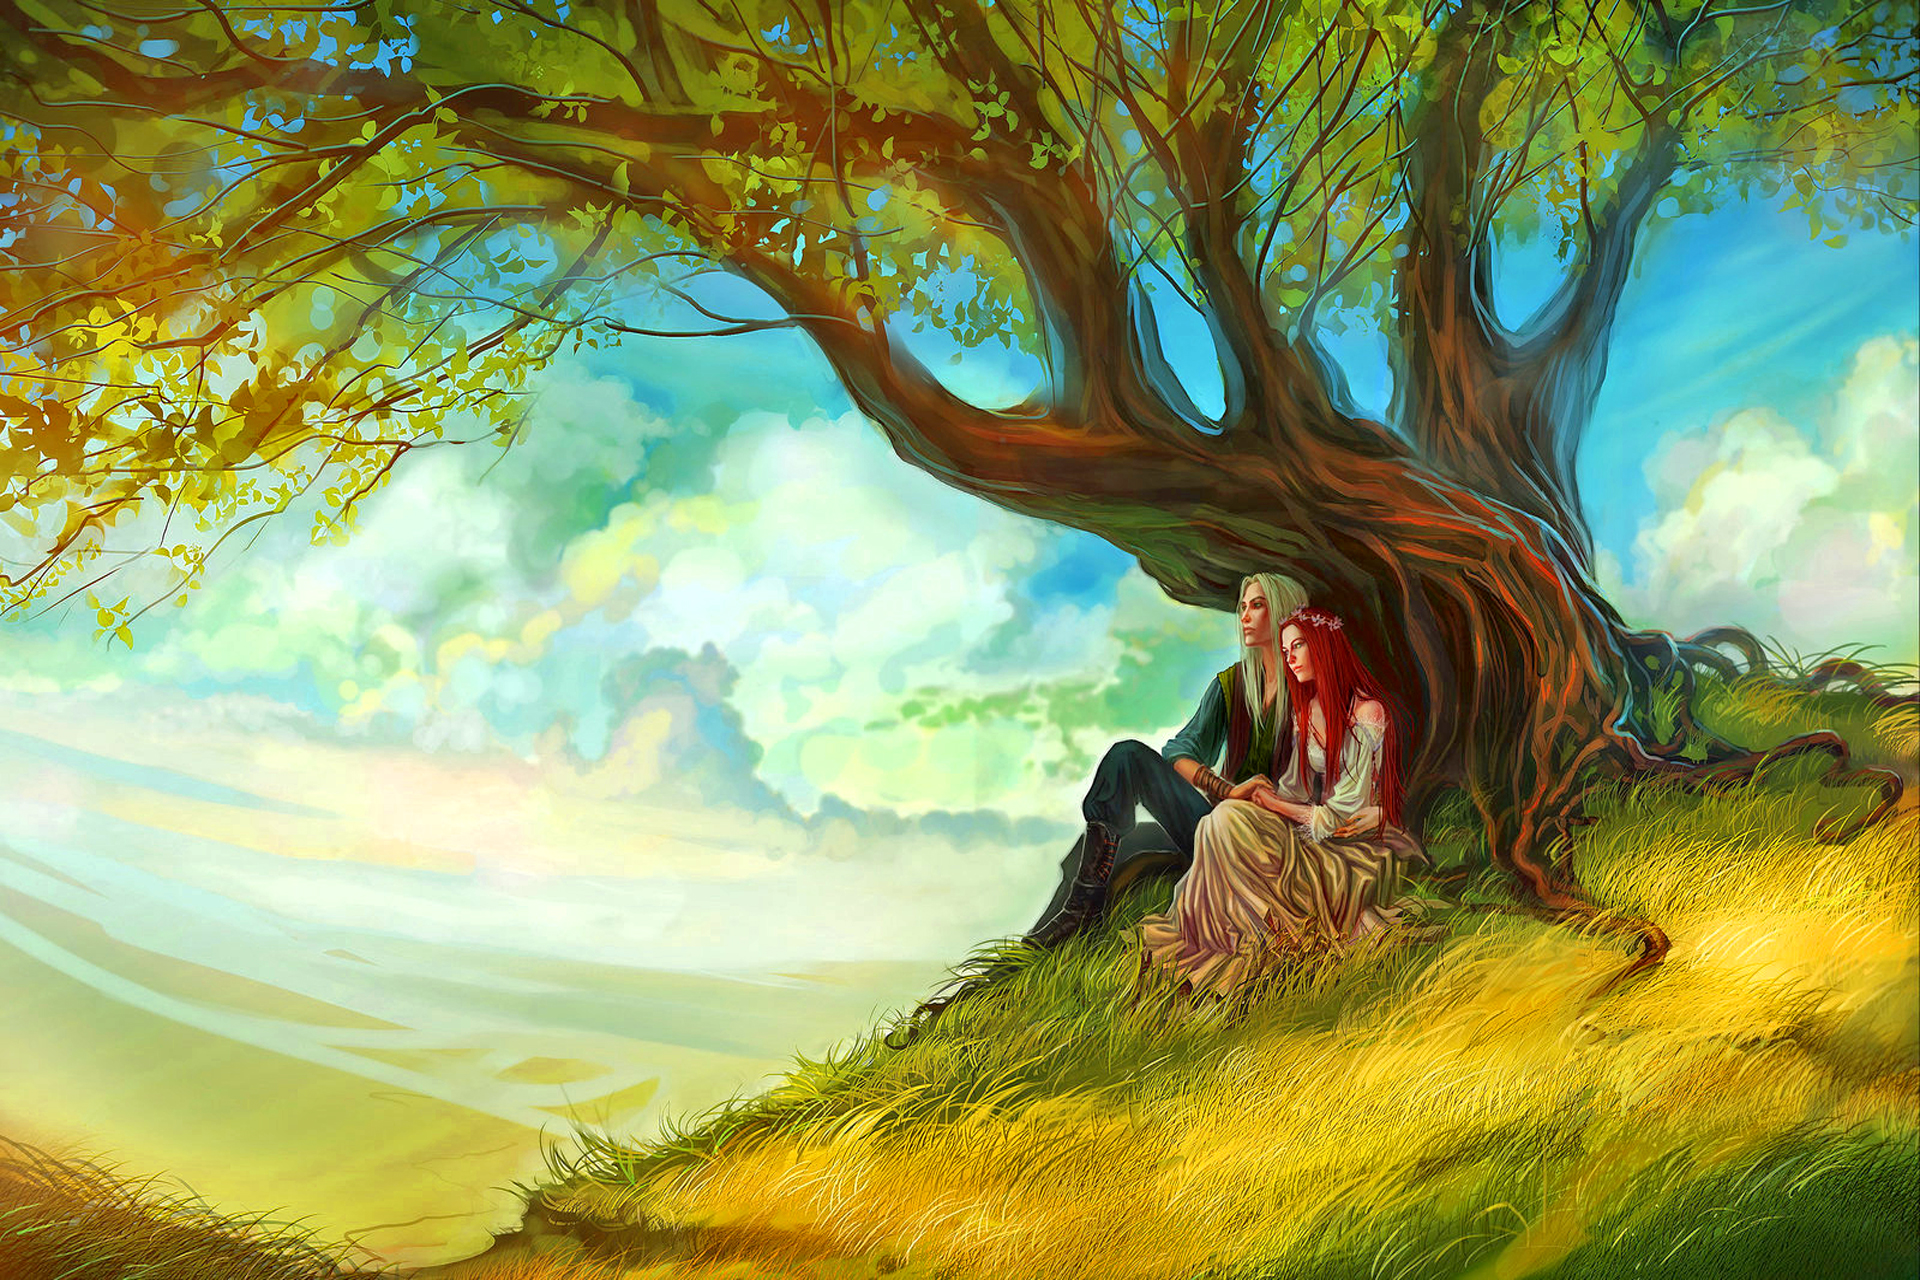 fantasy love art - id: 105594 - art abyss